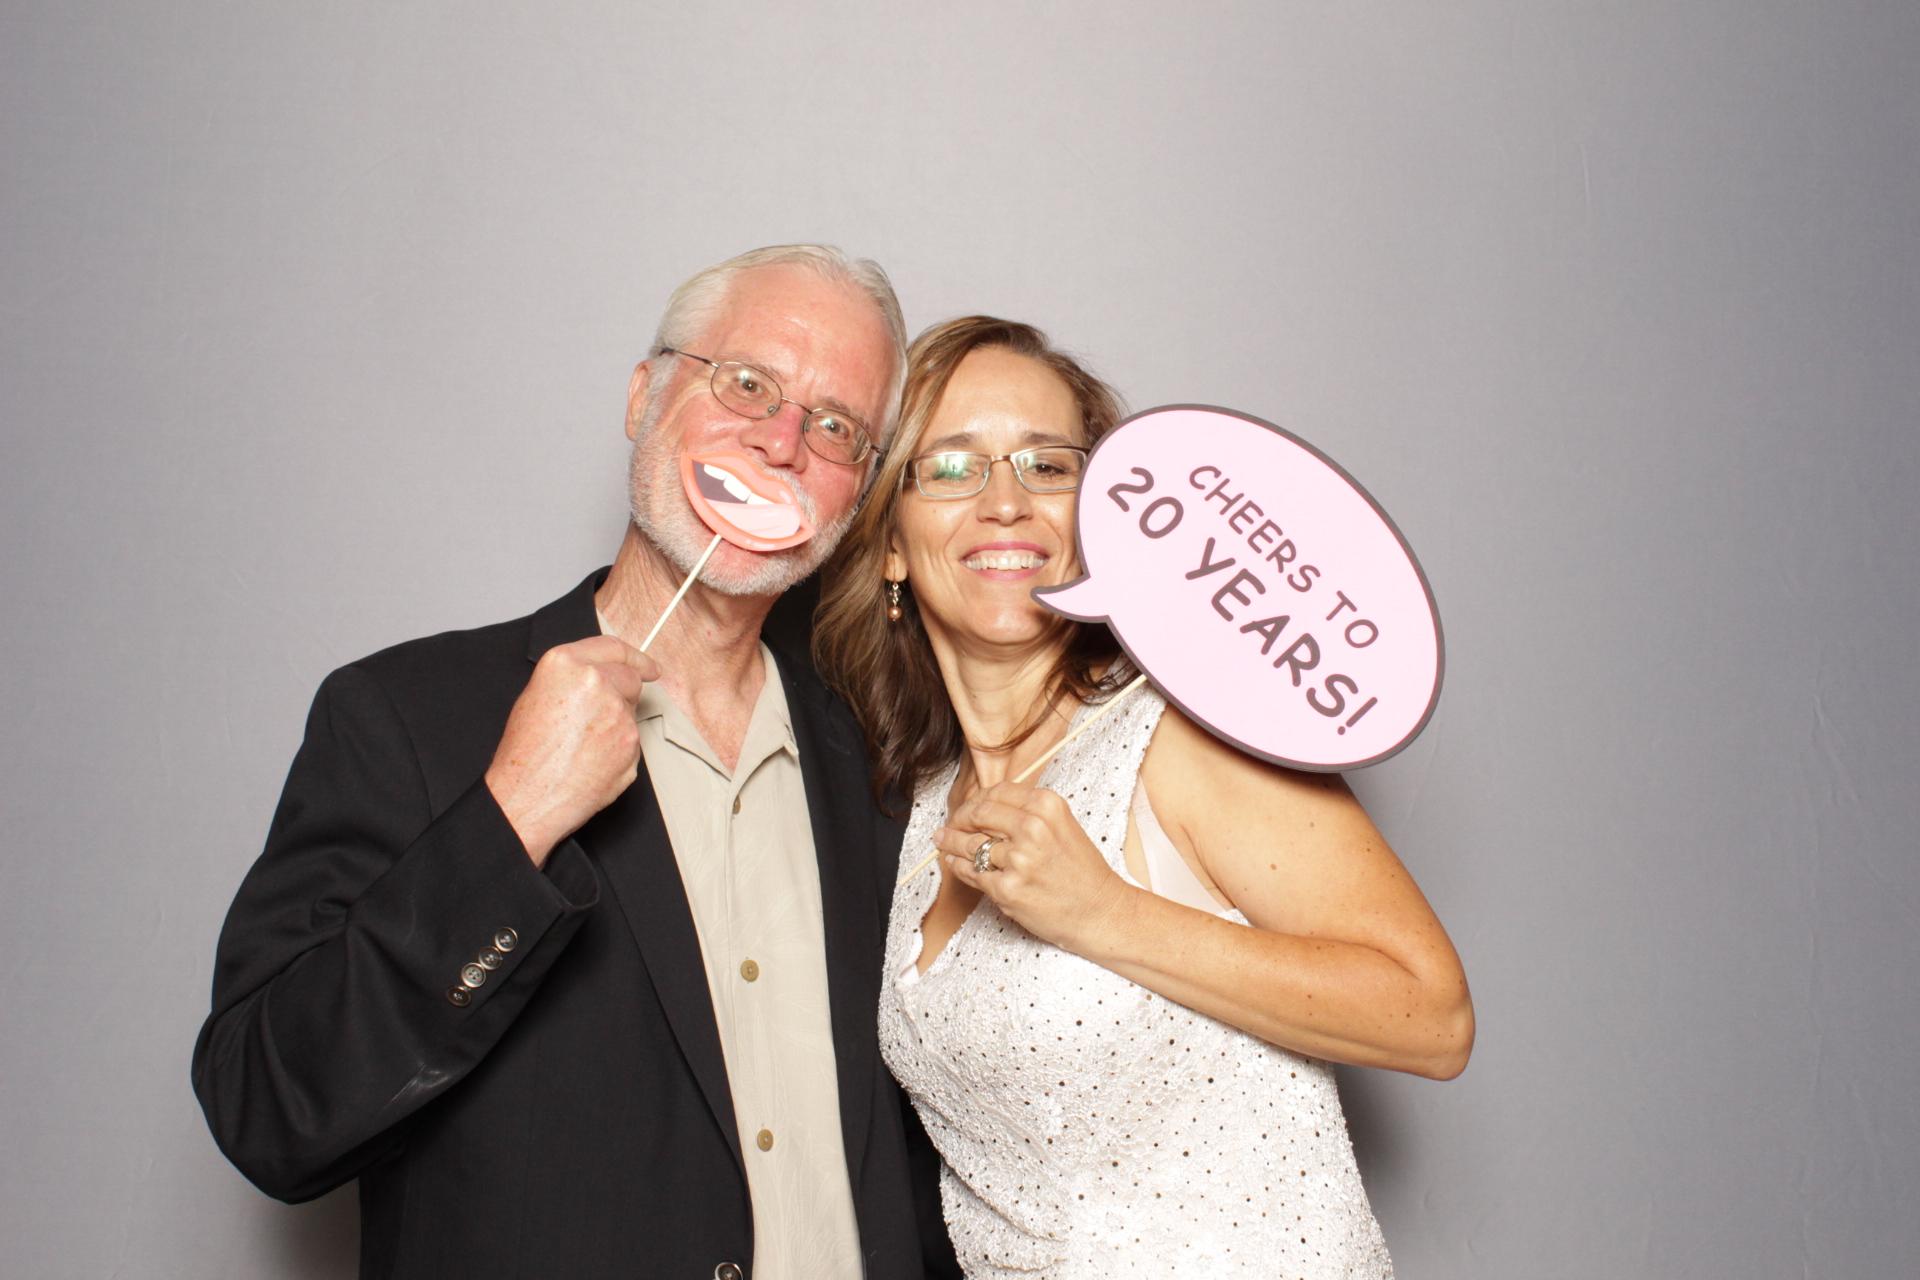 Cheers To 20 Years - Photo Booth Sponsored by: Ben & Catherine Ivy FoundationPointe Hilton Squaw Peak Resort, Phoenix, AZ10/20/2018